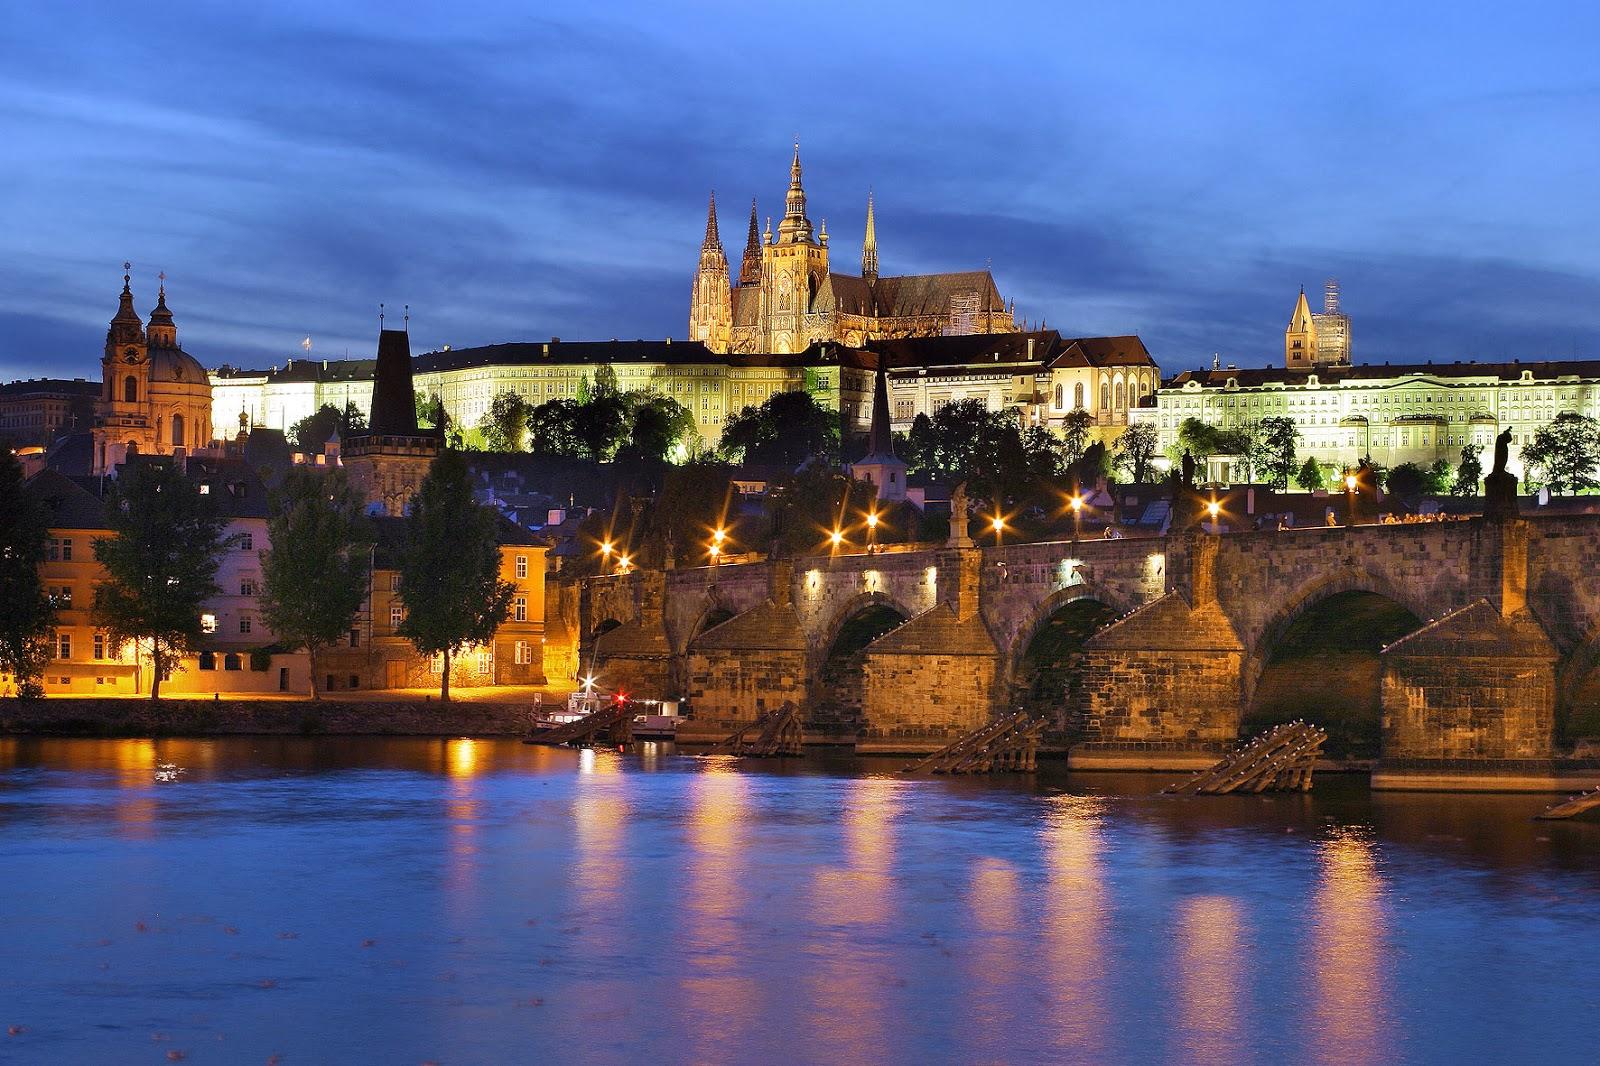 Vltava River Cruises, holiday in Prague, Wencelas Square, St. Nicholas Churh, Torture Museum, Communism museum, Old Town Square, Prague castle